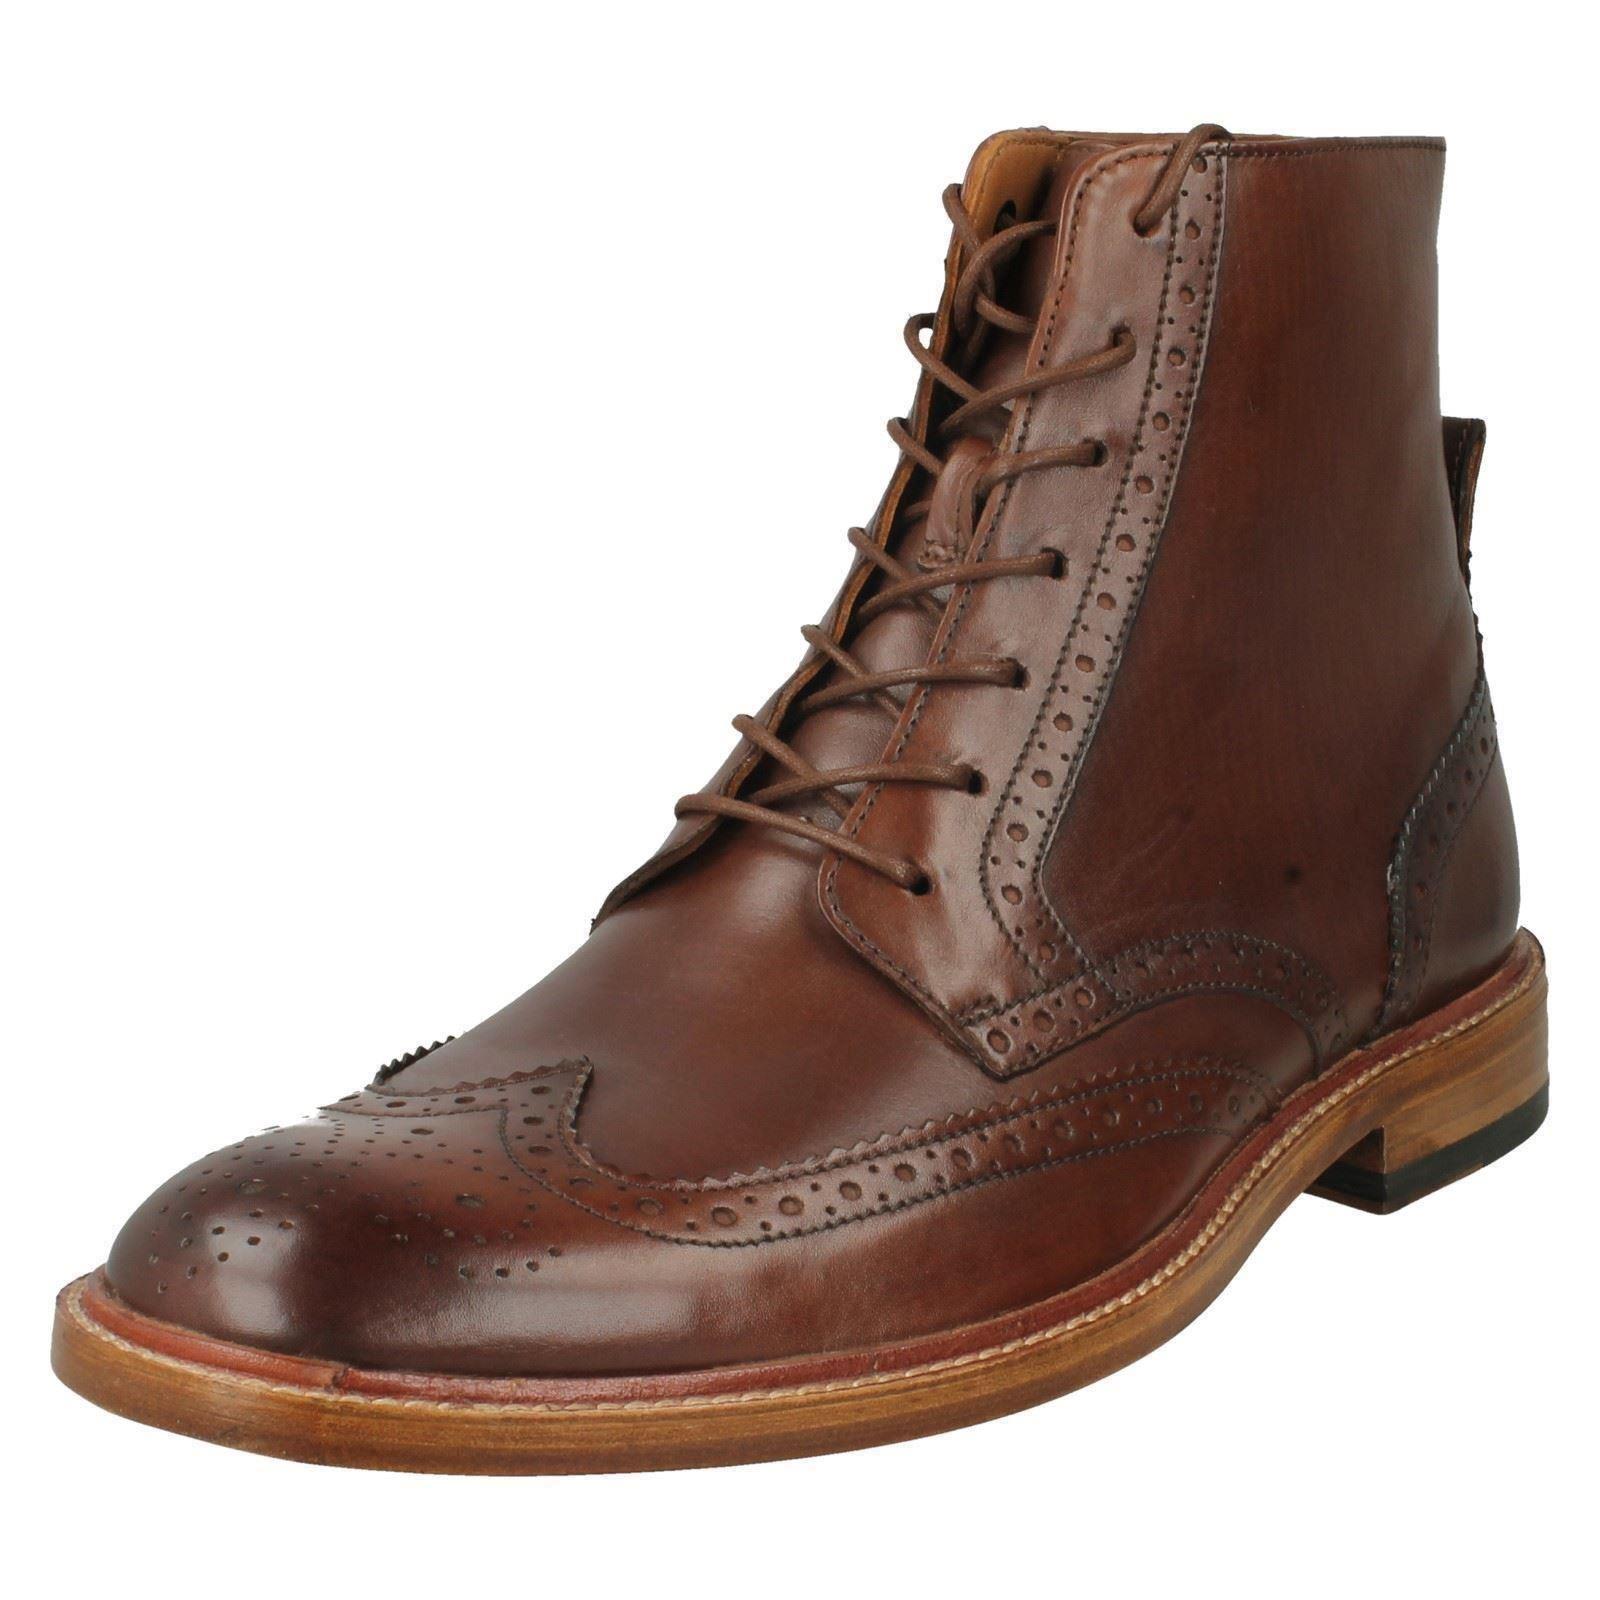 Uomo Uomo Uomo Clarks Leder Lace Up Brogue Ankle Stiefel Style -  James Hi f1833e